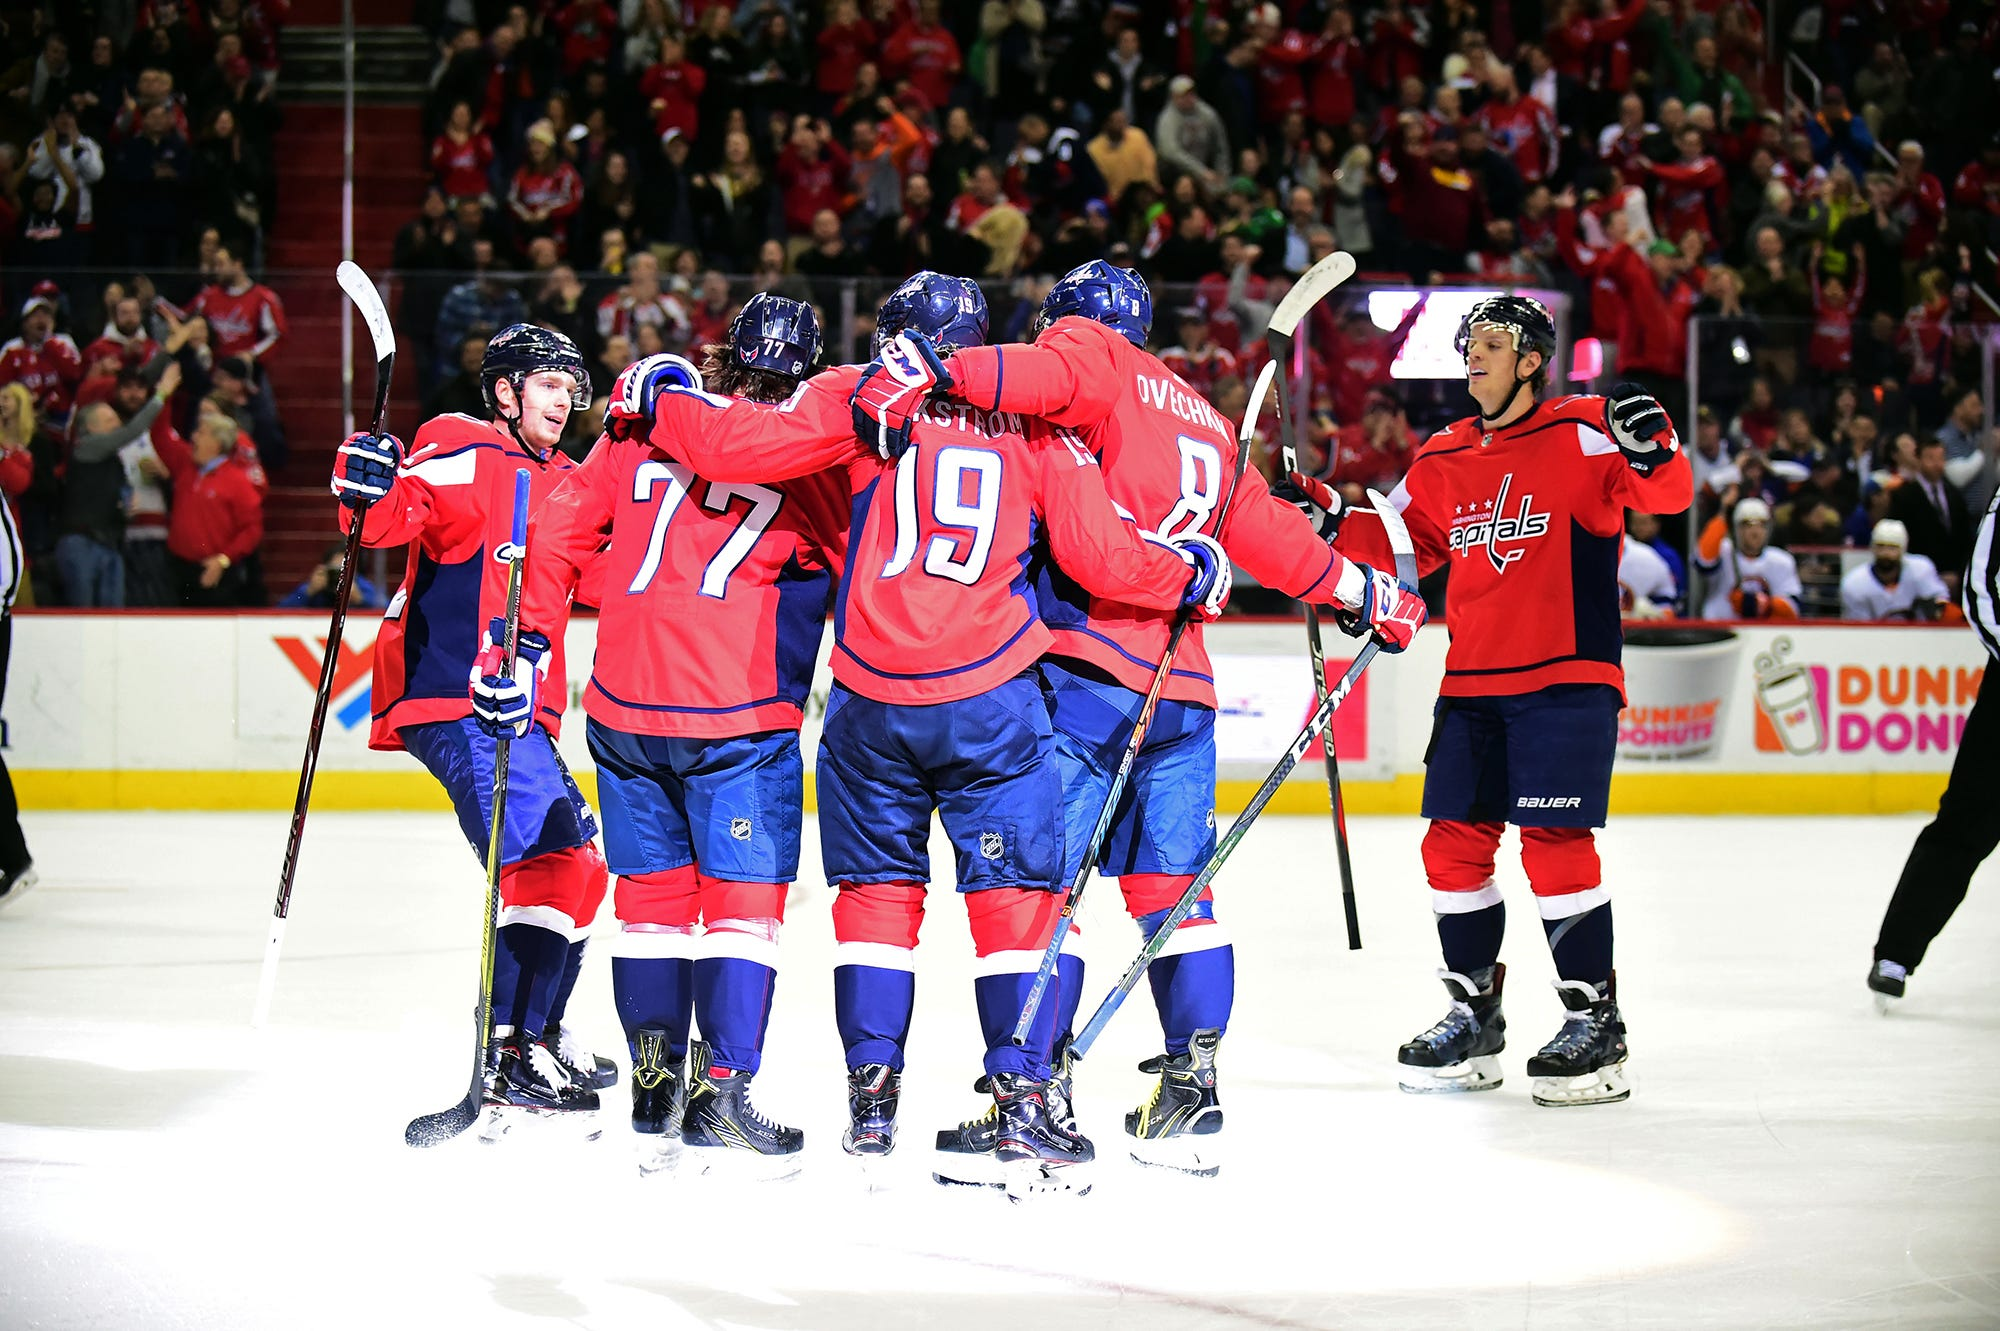 T.J. Oshie, Nicklas Backstrom score as Capitals down Islanders